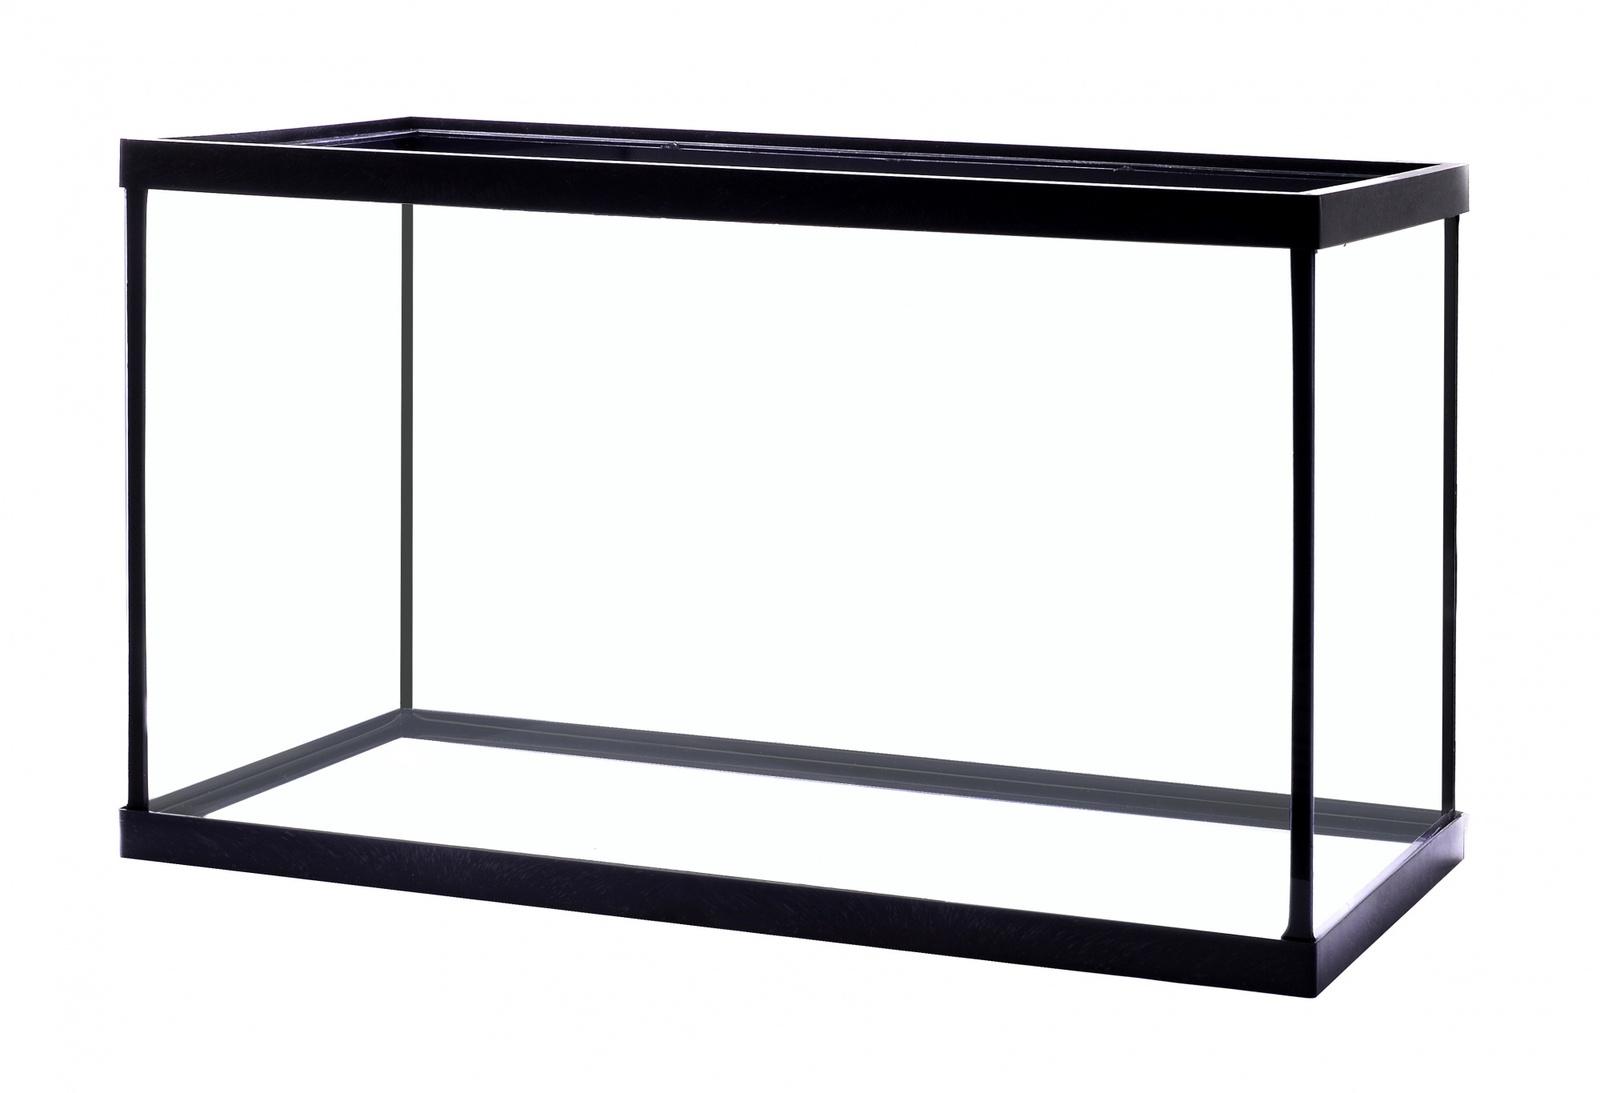 benelux Benelux Аквариум прямоугольный, 50 * 25 * 30 см (Glass fish tank L) 4484 50508